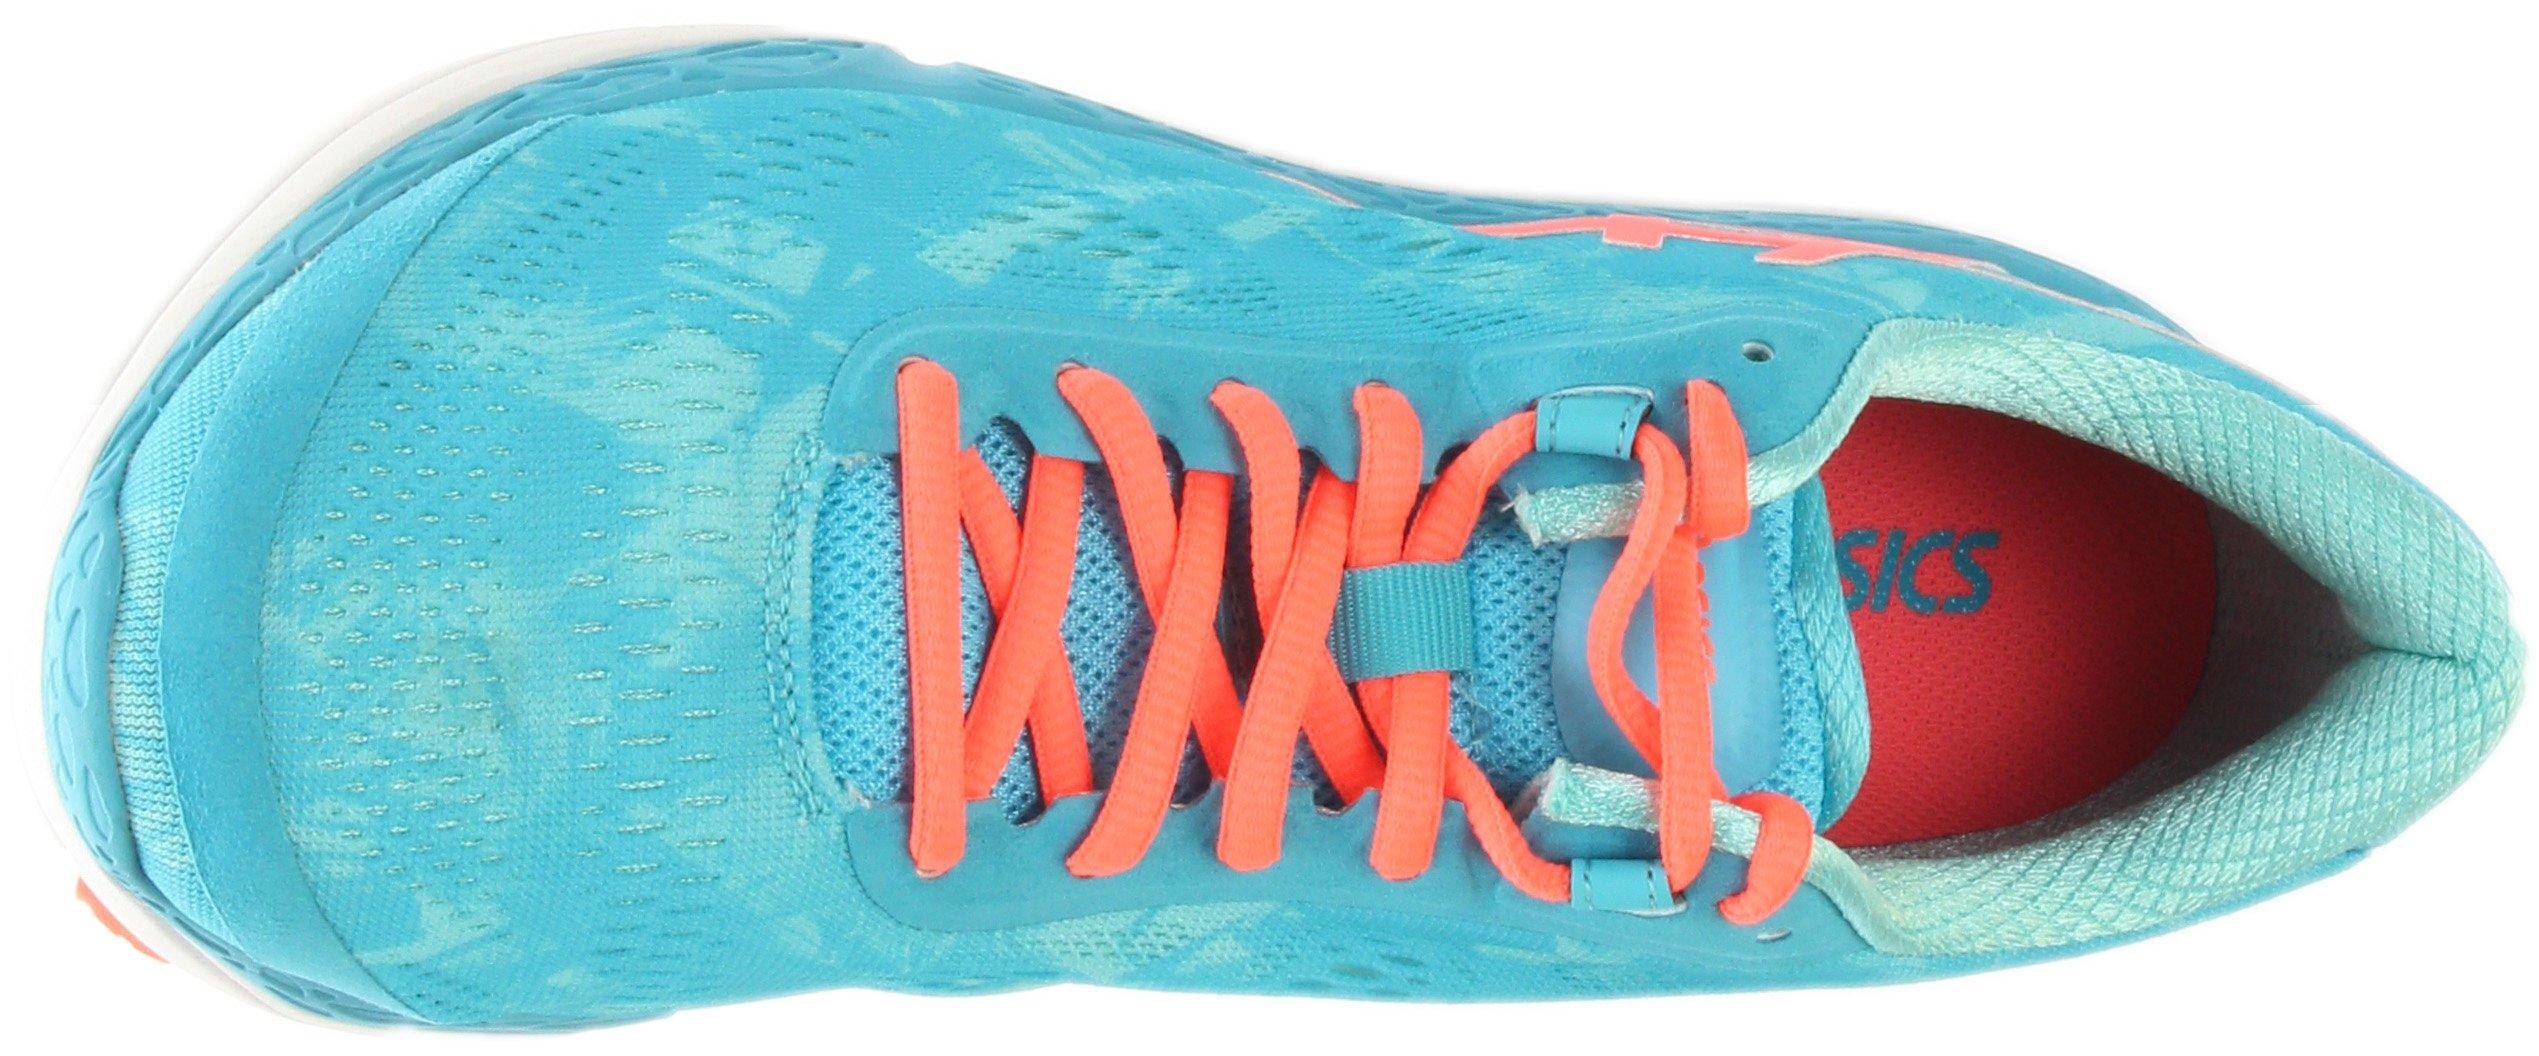 ASICS Women's 33-M 2 Running Shoe, Aquarium/Flash Coral/Aruba Blue, 9.5 M US by ASICS (Image #6)